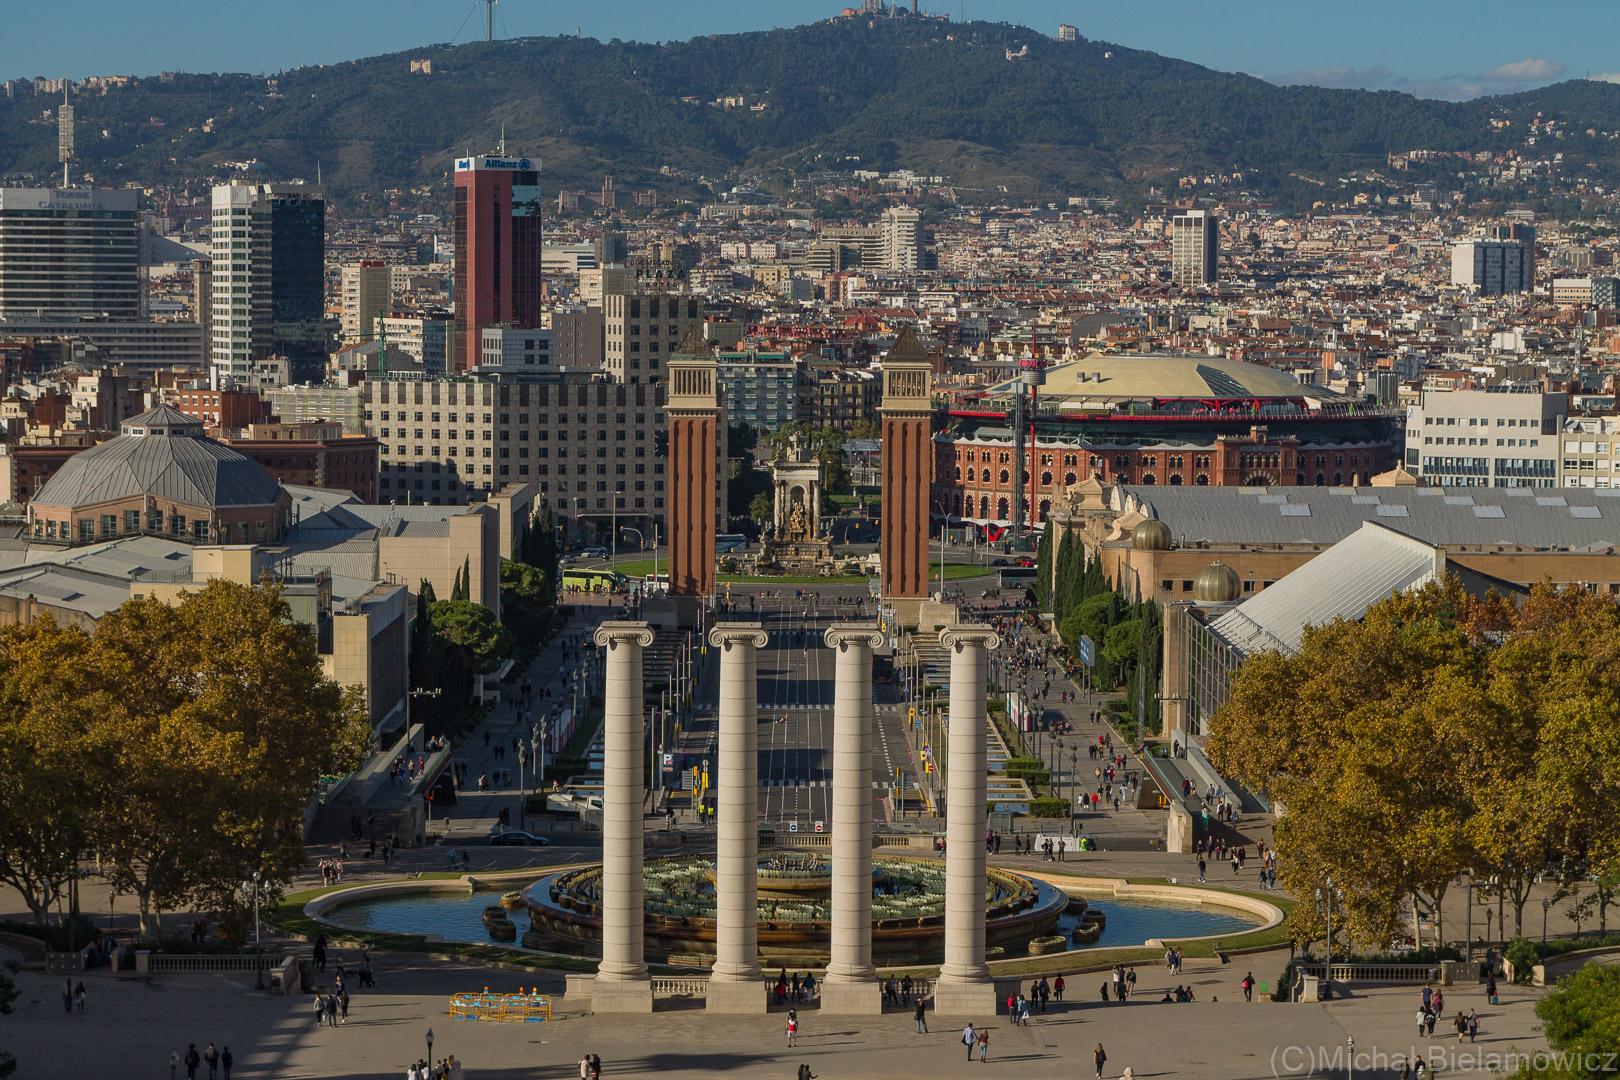 Plac Hiszpański - Plaça d'Espanya